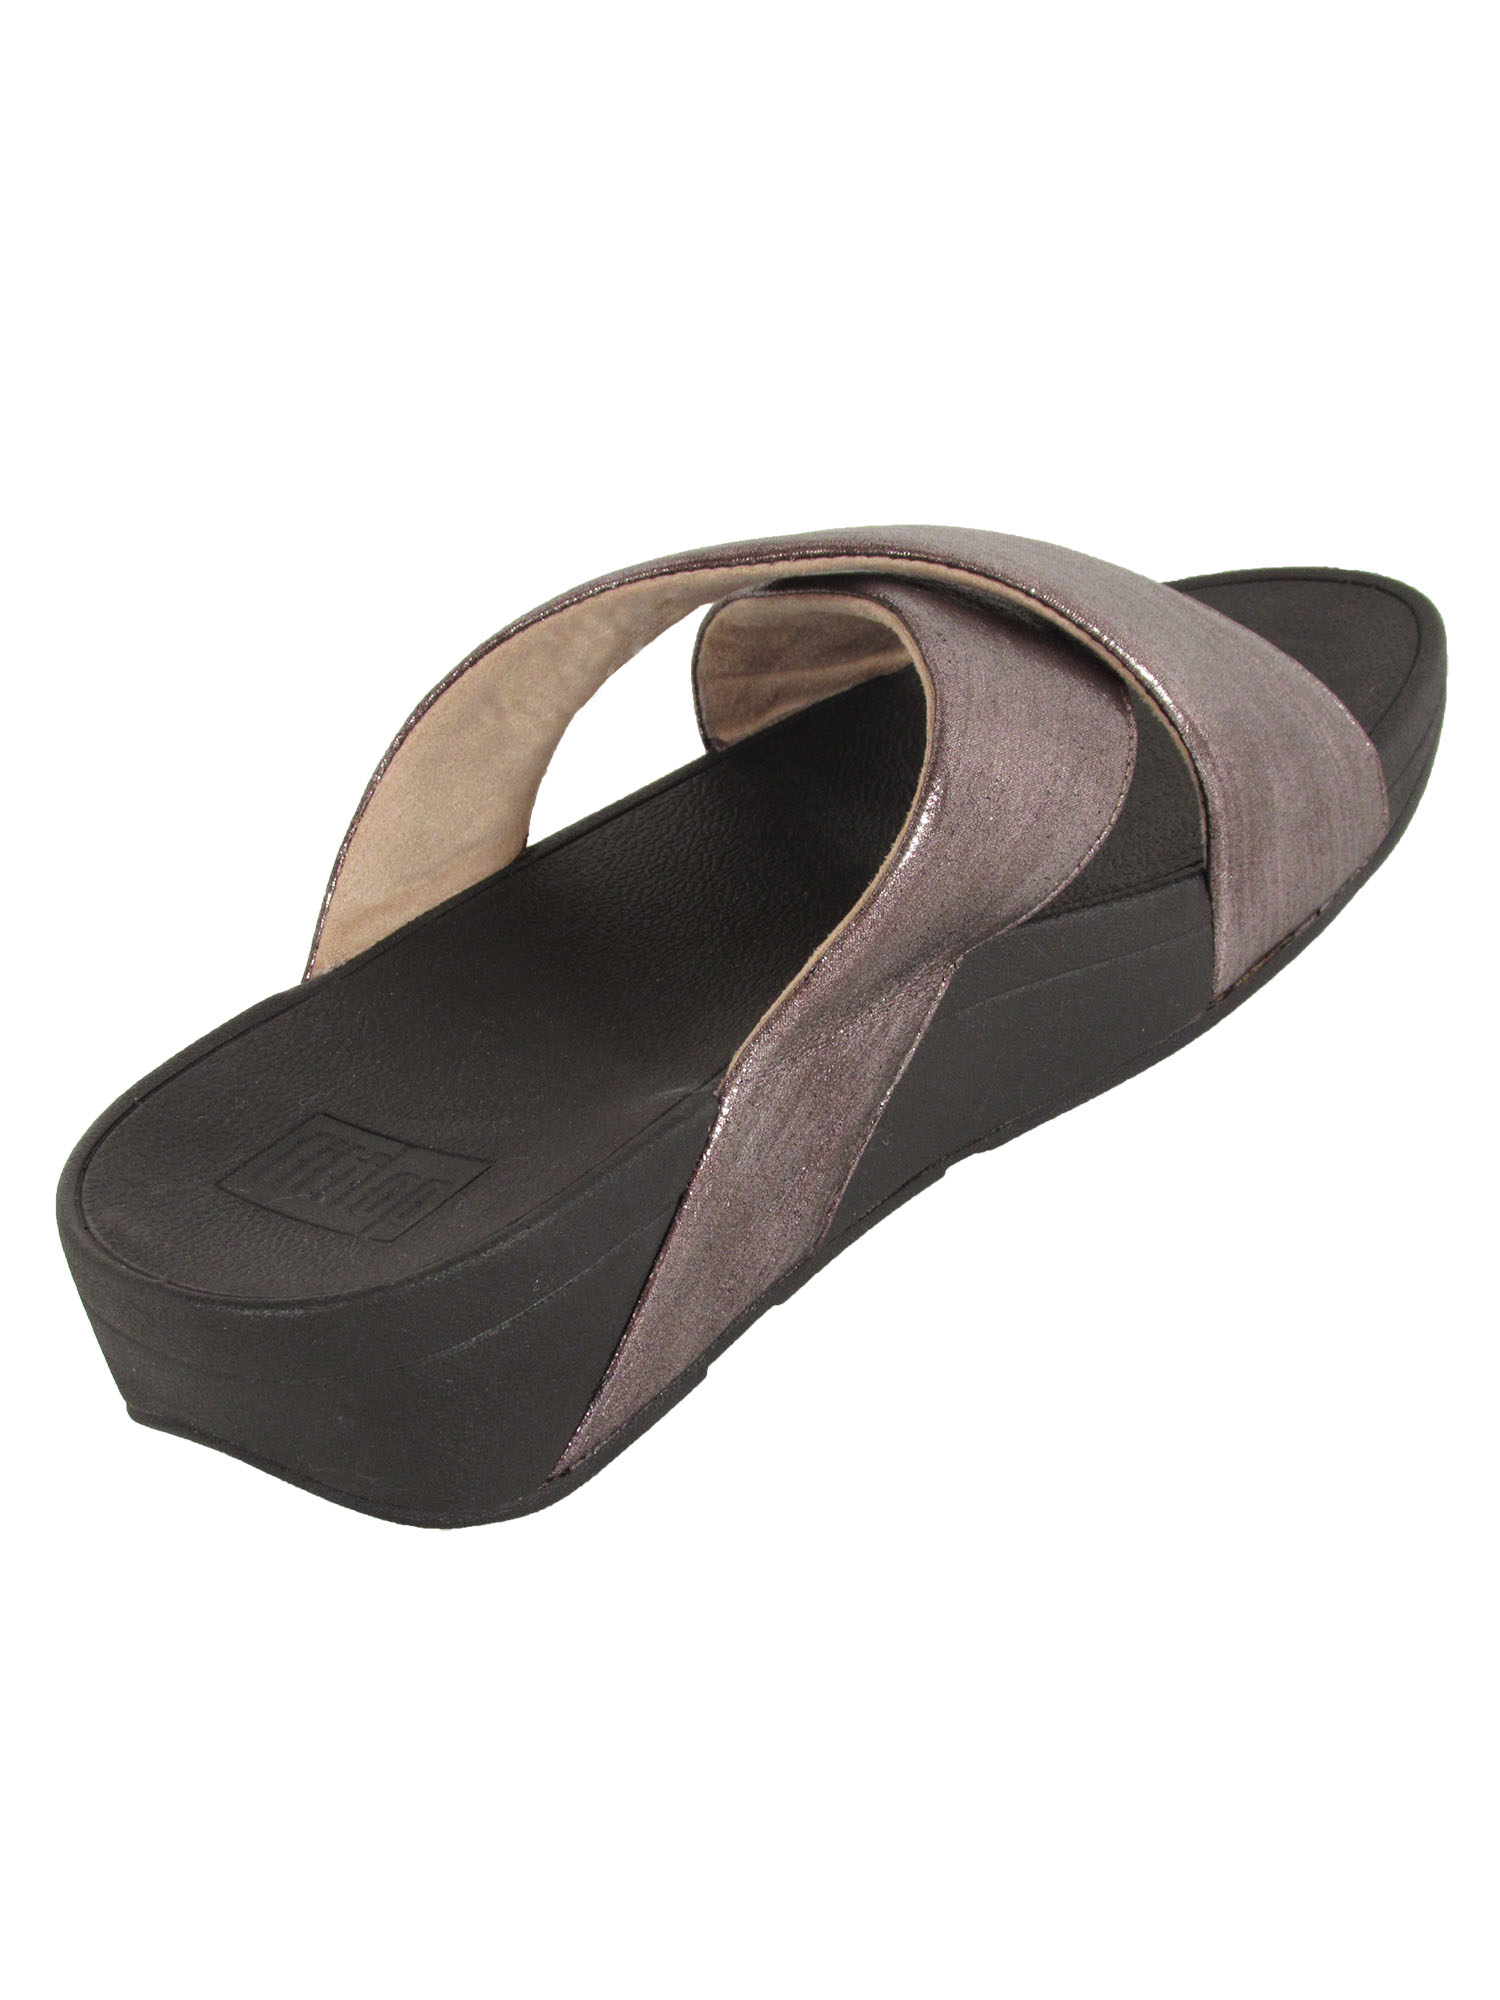 Fitflop-Womens-Lulu-Cross-Glitz-Slide-Sandal-Shoes thumbnail 13